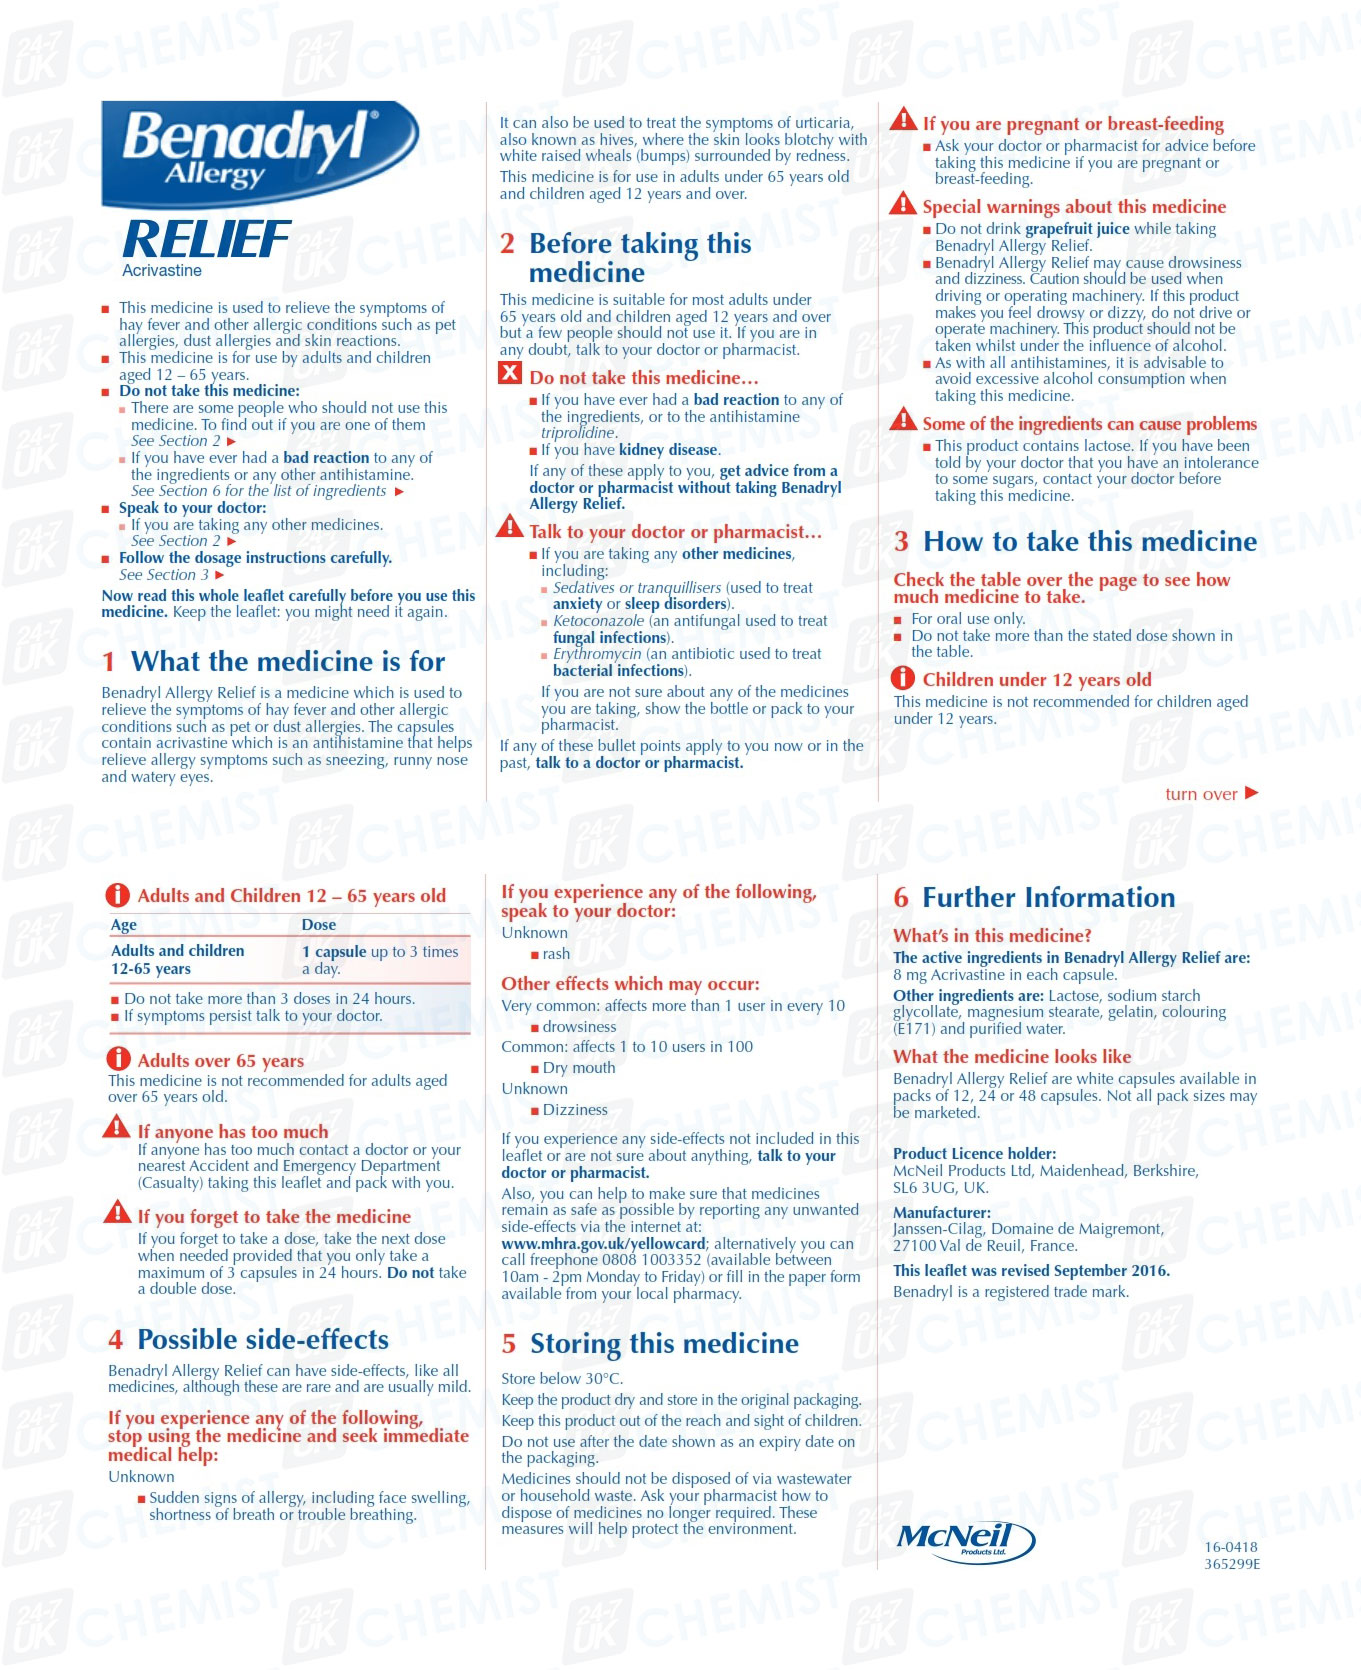 Lovable Patient Information Leaflet Benadryl Allergy Relief